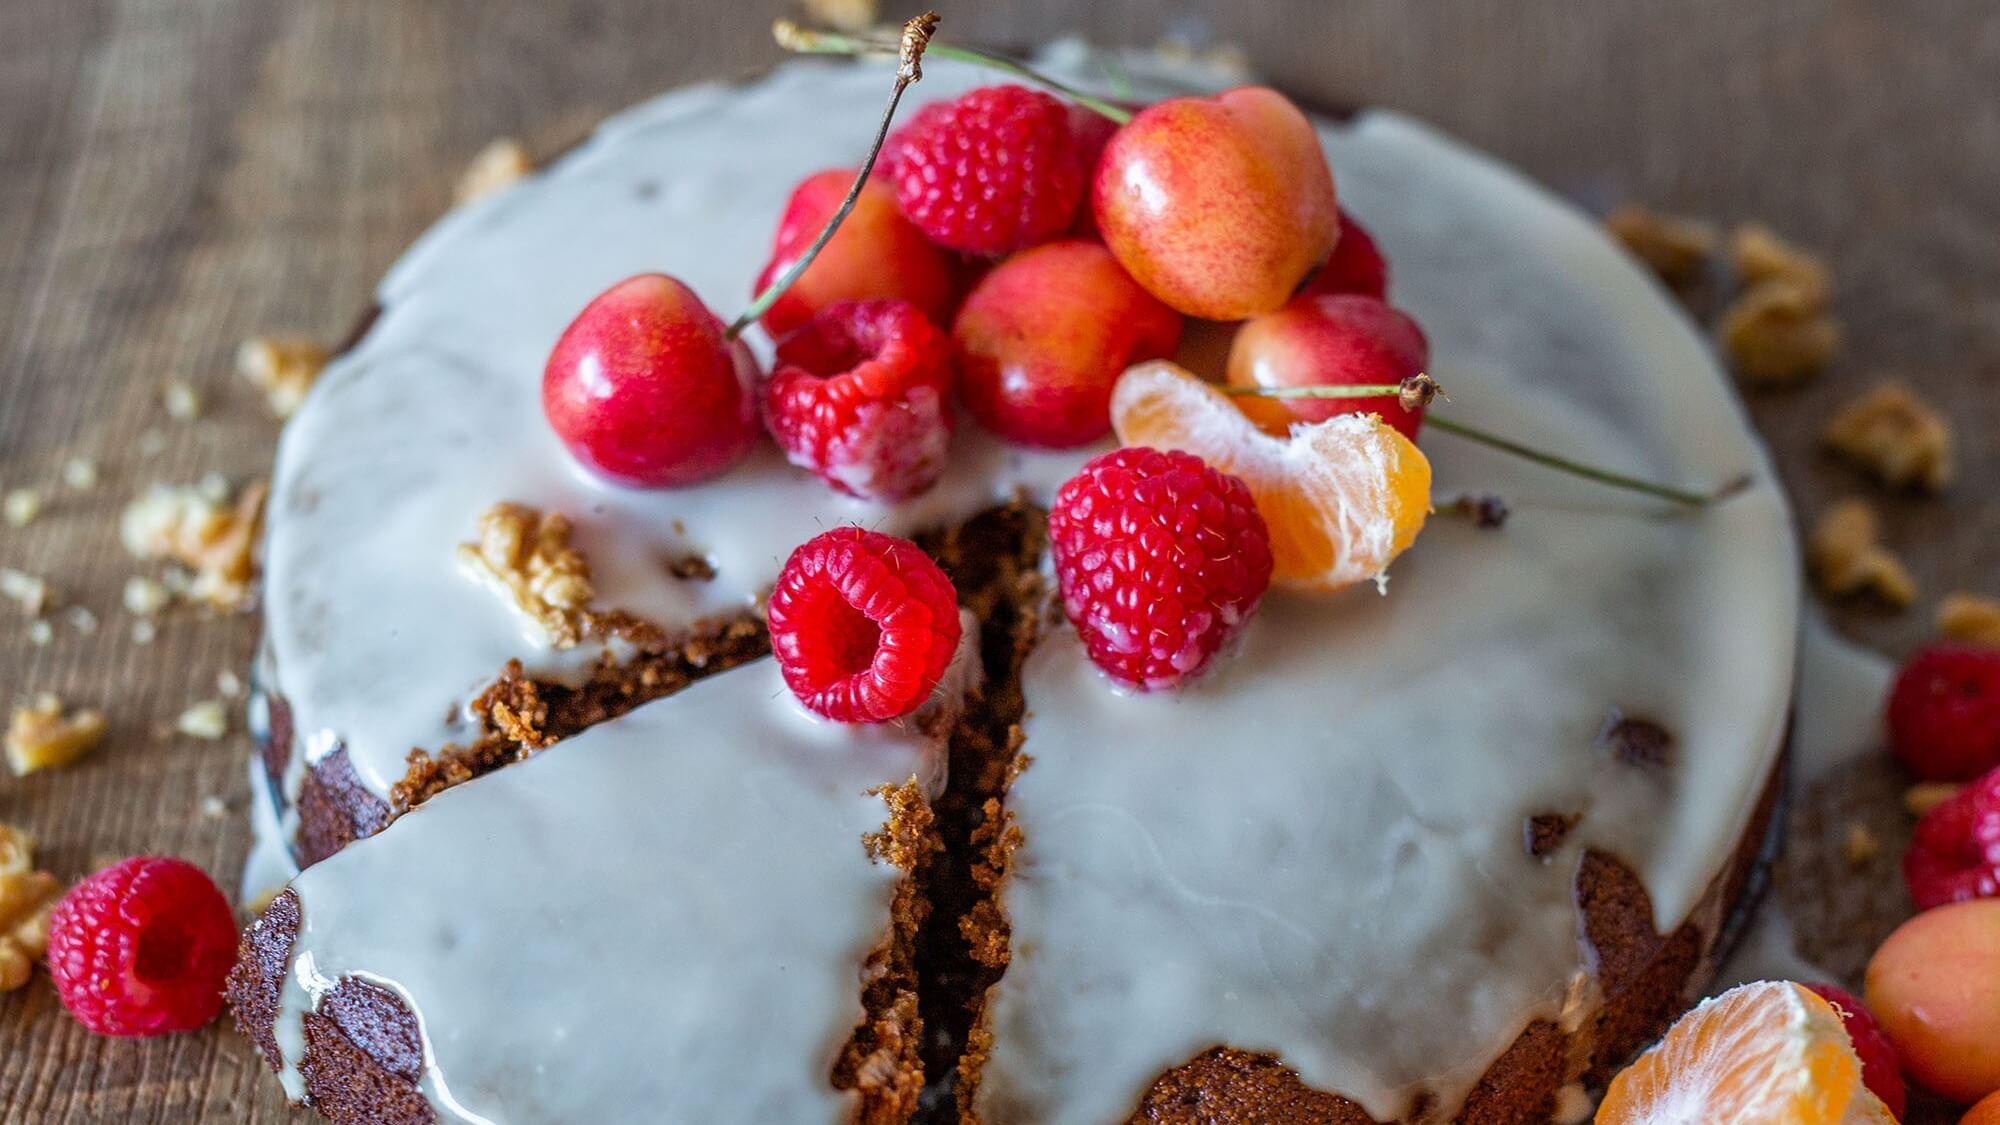 Vegan Mandarin and Polenta Cake With Dairy-Free Yogurt Frosting